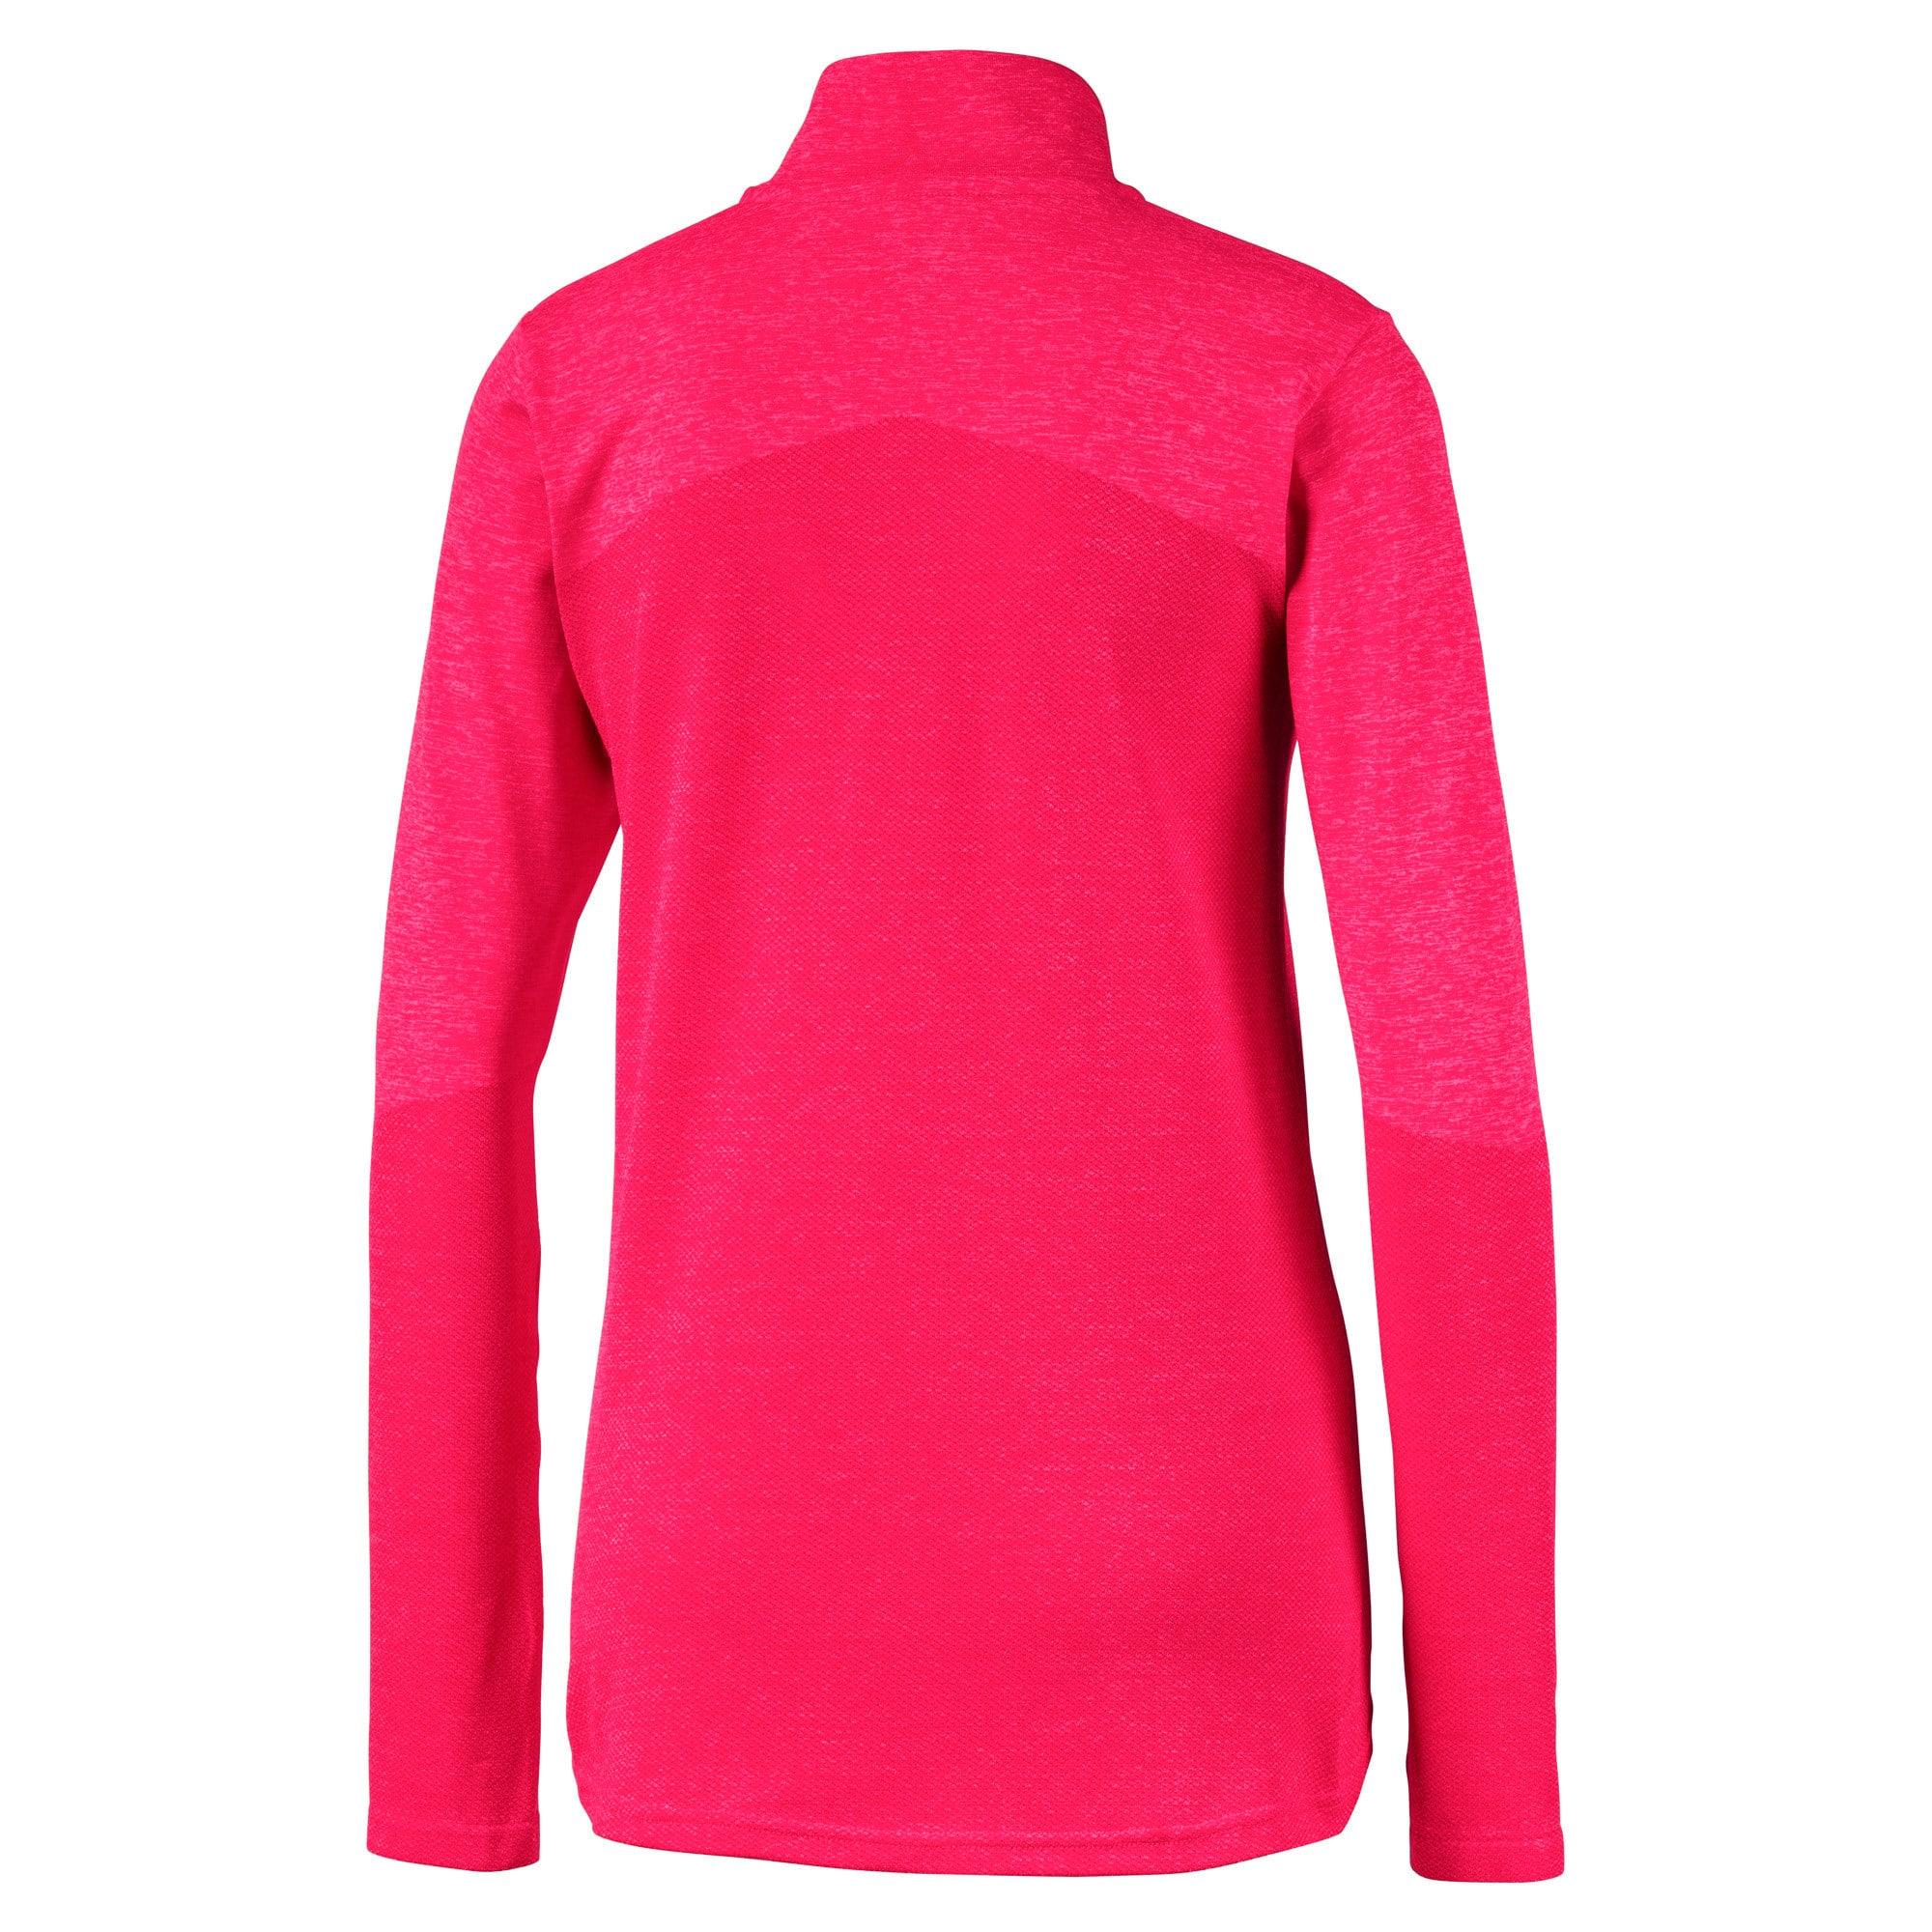 Thumbnail 6 of evoKNIT 1/4 Zip Damen Golf Pullover, Azalea Heather, medium